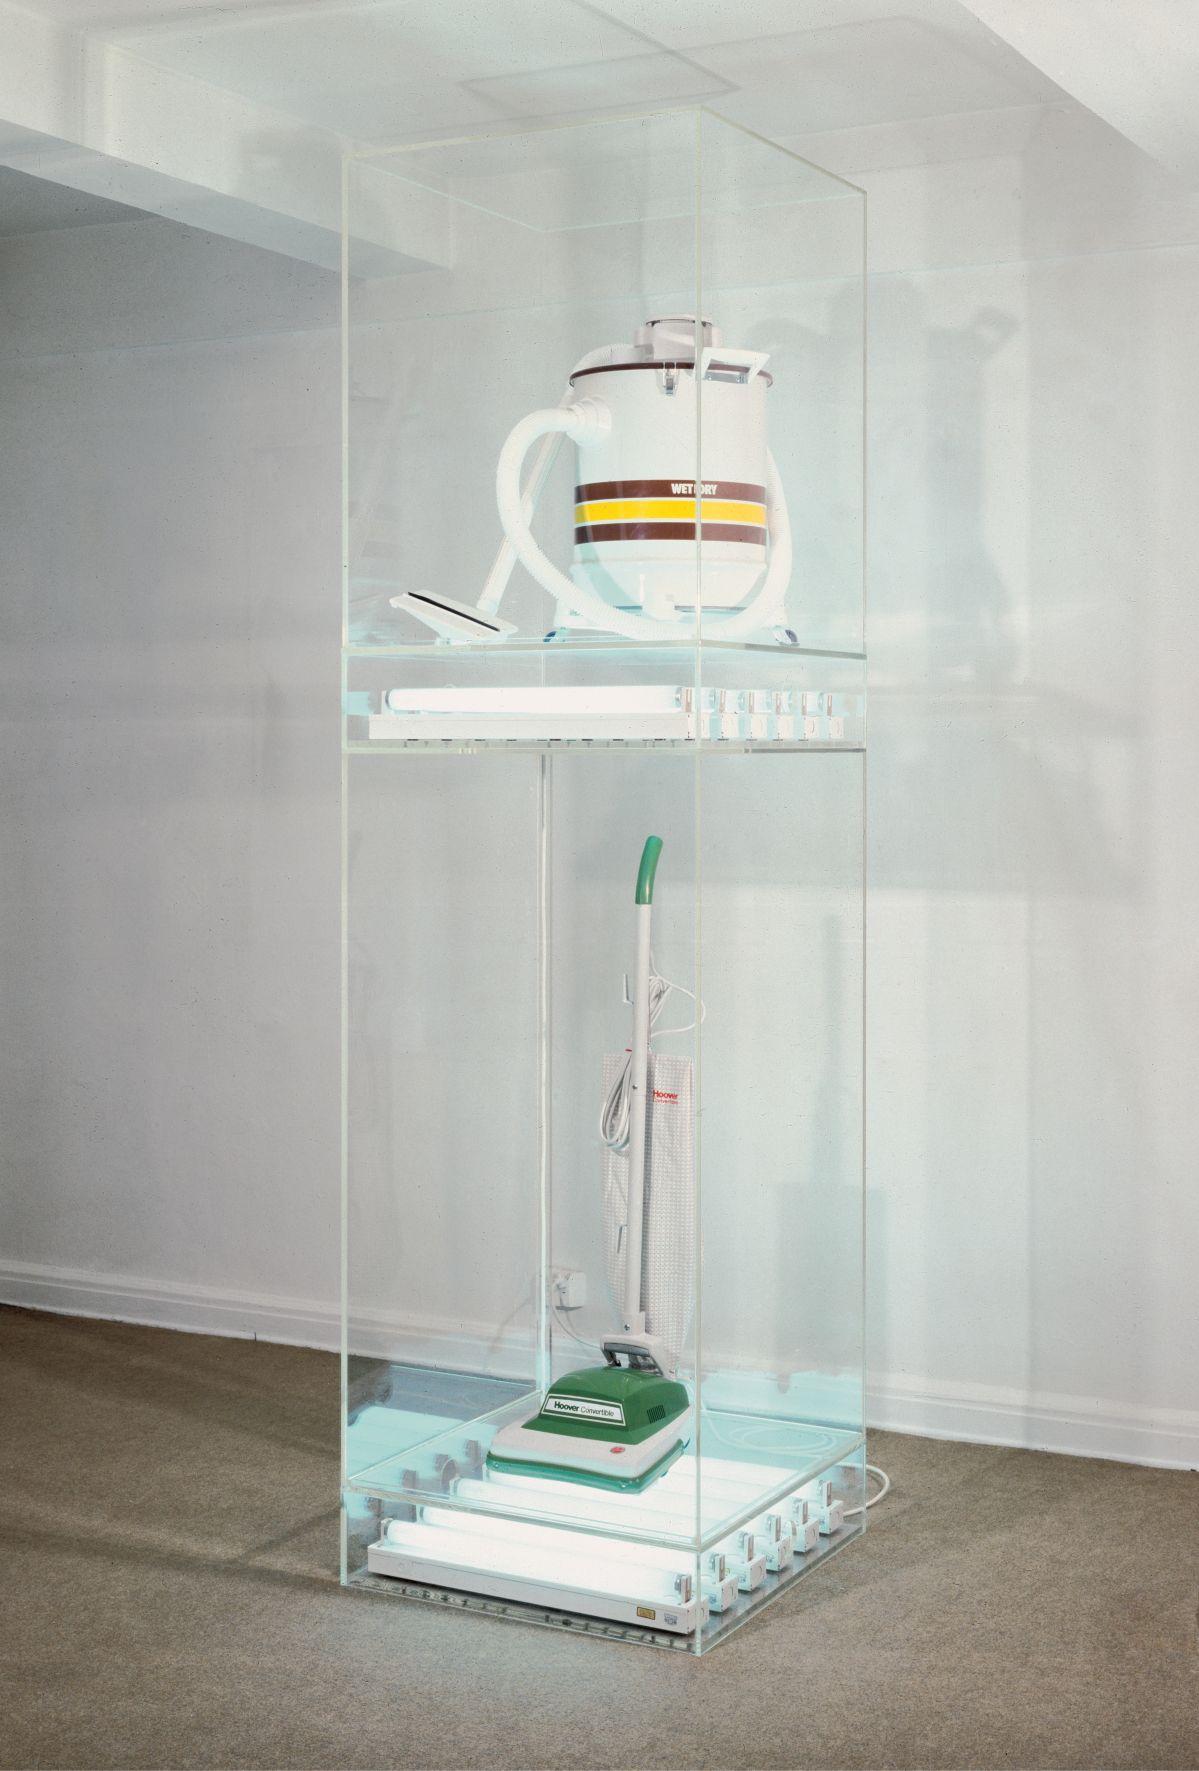 Jeff Koons. New Hoover Convertible, New Shelton Wet/Dry 10 Gallon Doubledecker, 1981. Deux aspirateurs, acrylique et tubes fluorescents. 251,5 × 71,1 × 71,1 cm ; 99 × 28 × 28 inches. Pinault Collection © Jeff Koons